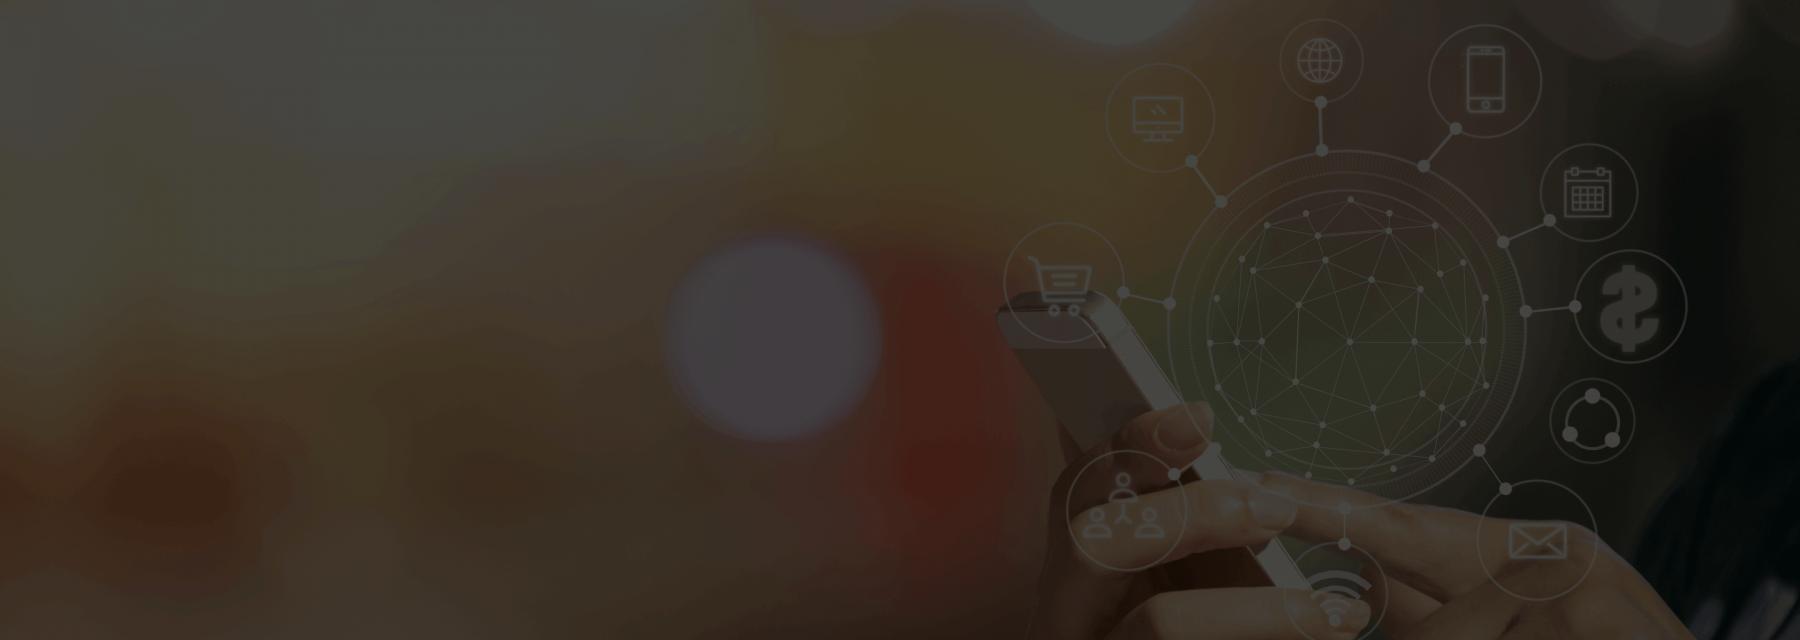 Consumer Internet Applications